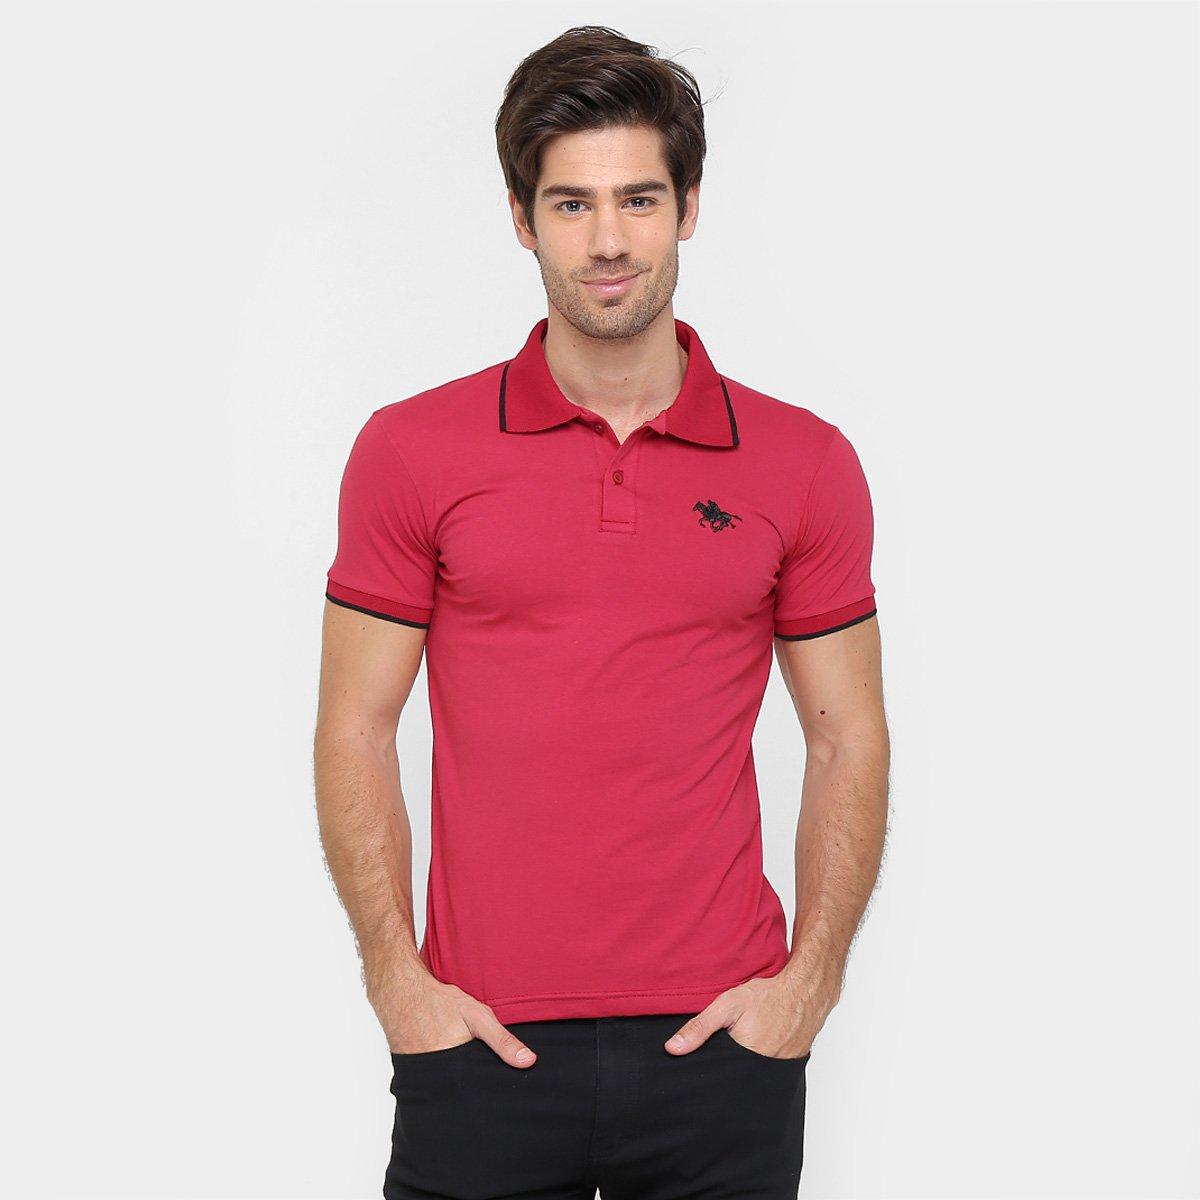 0ad46484a Camisa Polo RG 518 Malha Friso Logo Masculina